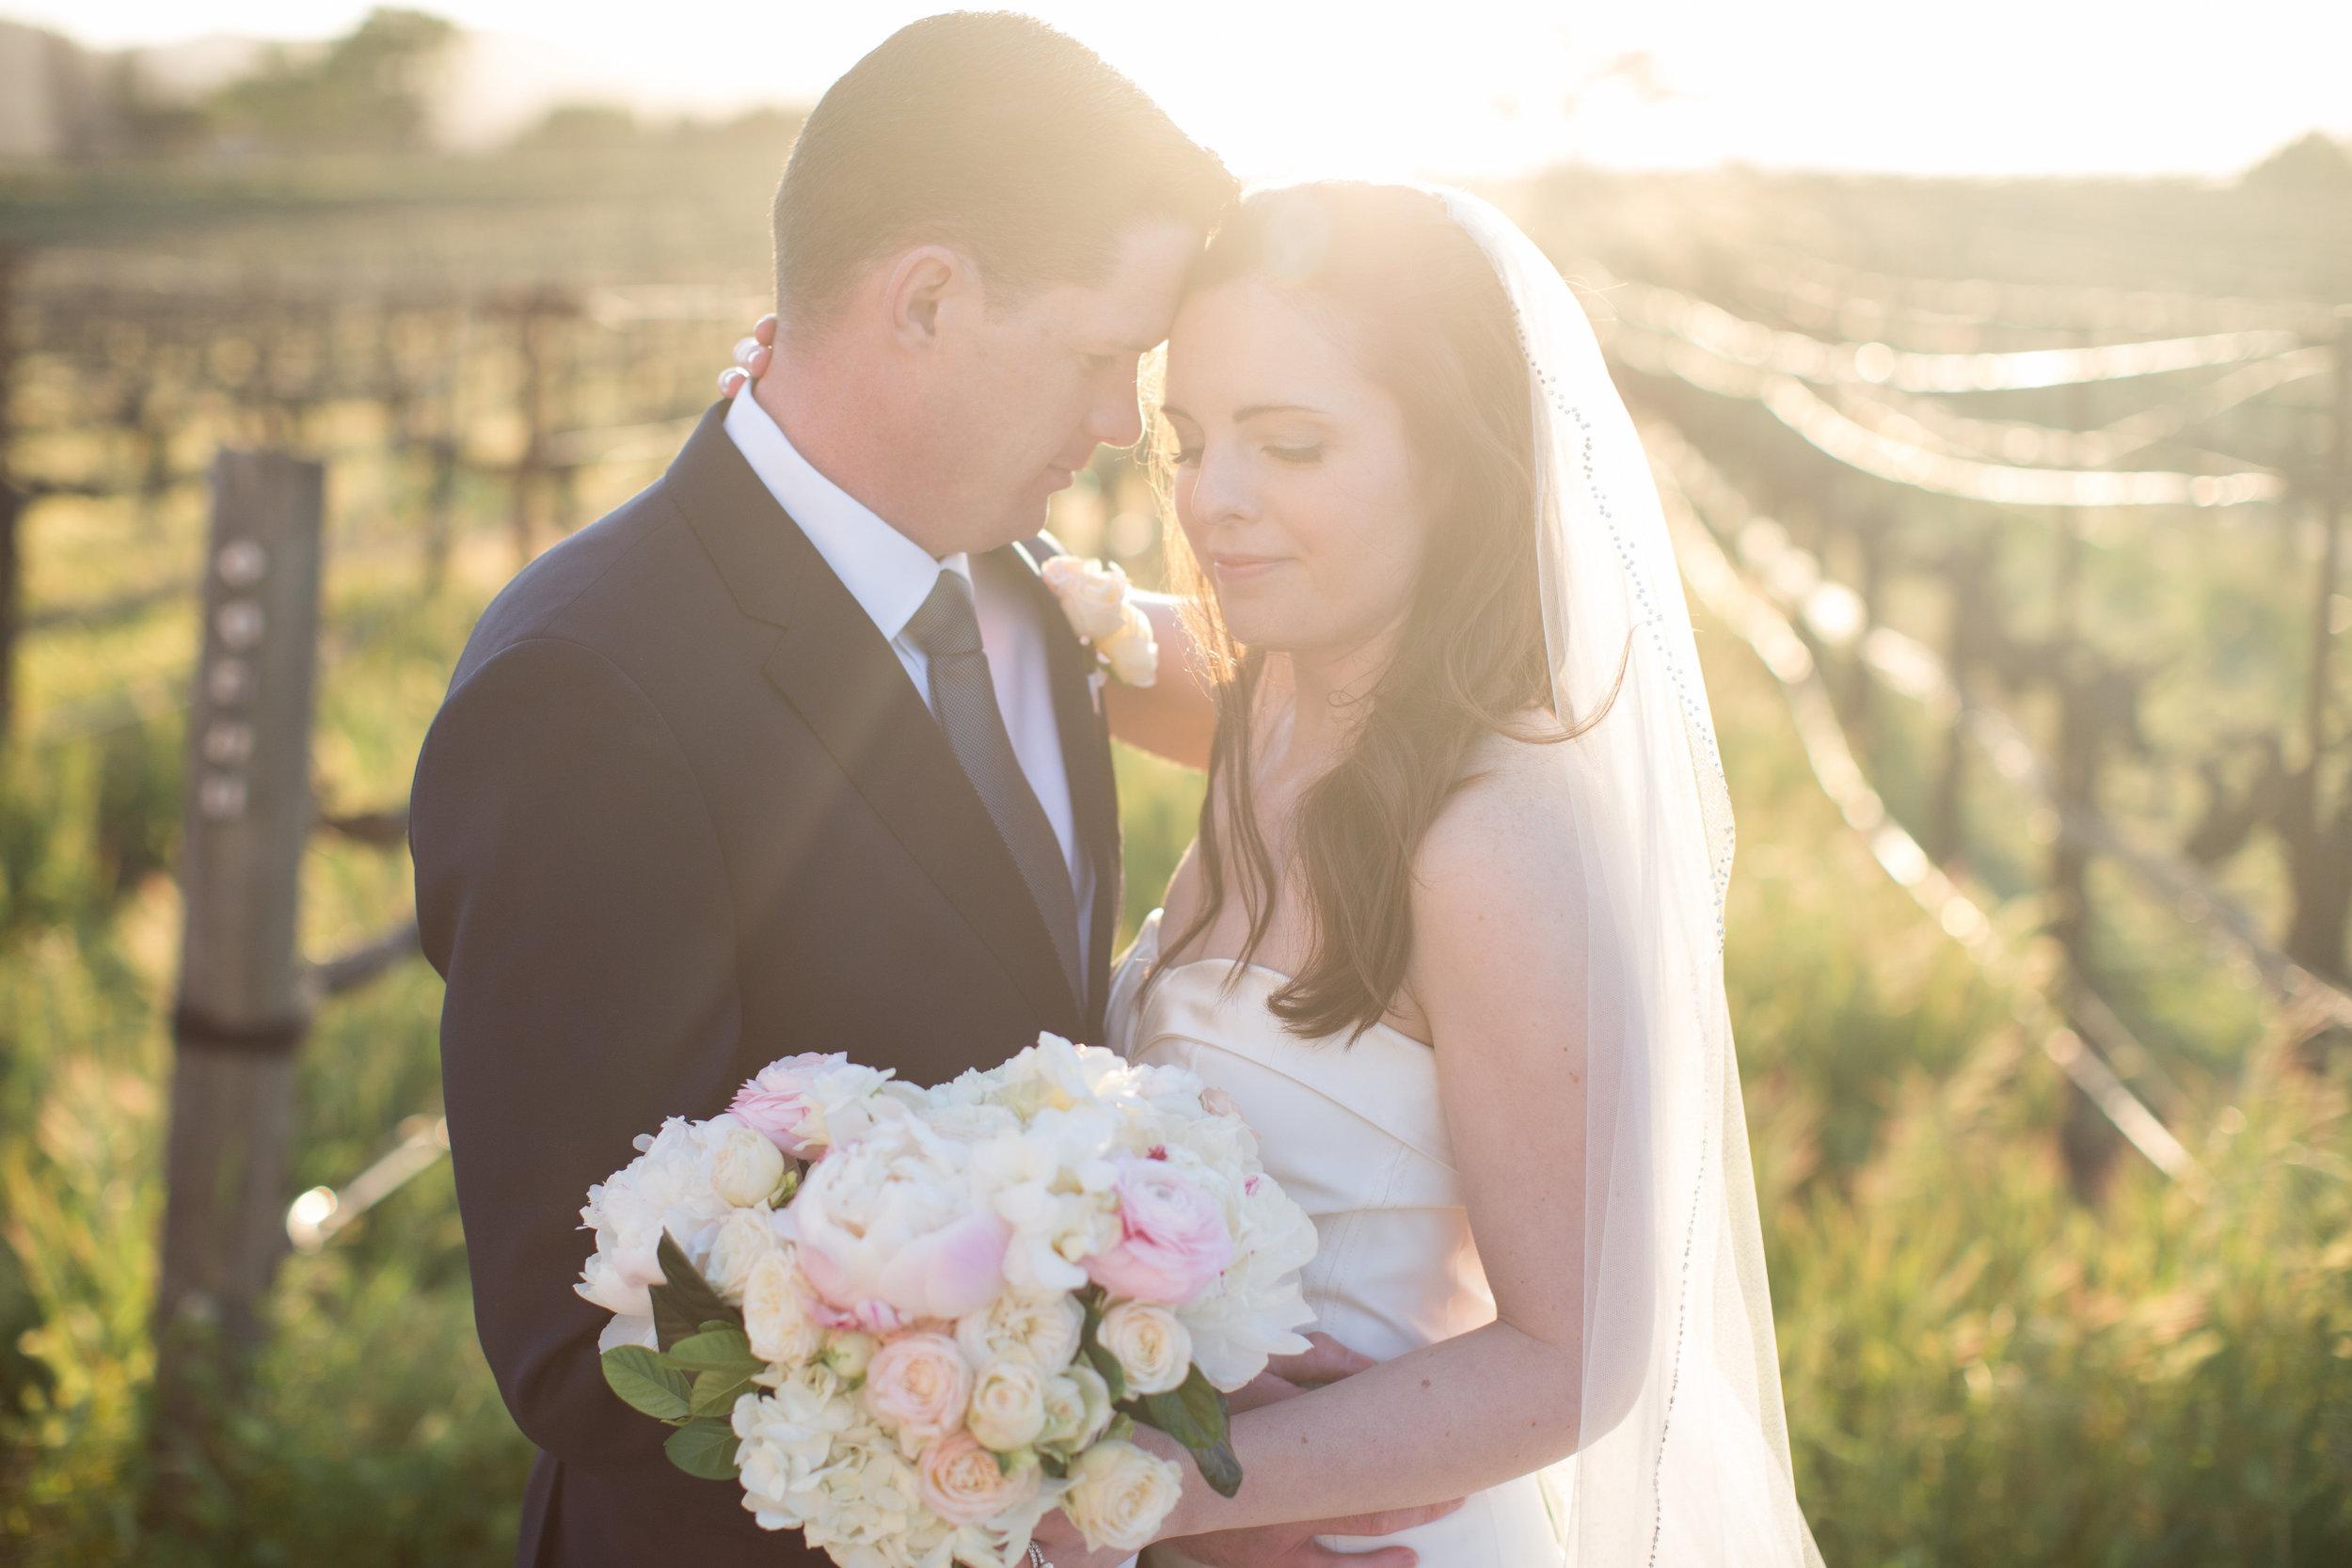 santa-barbara-elopement-wedding-planner-planning-coordinator-event-day-of-sunstone-winery-villa-tuscan-vineyard-gold-classic-elope (19).jpg